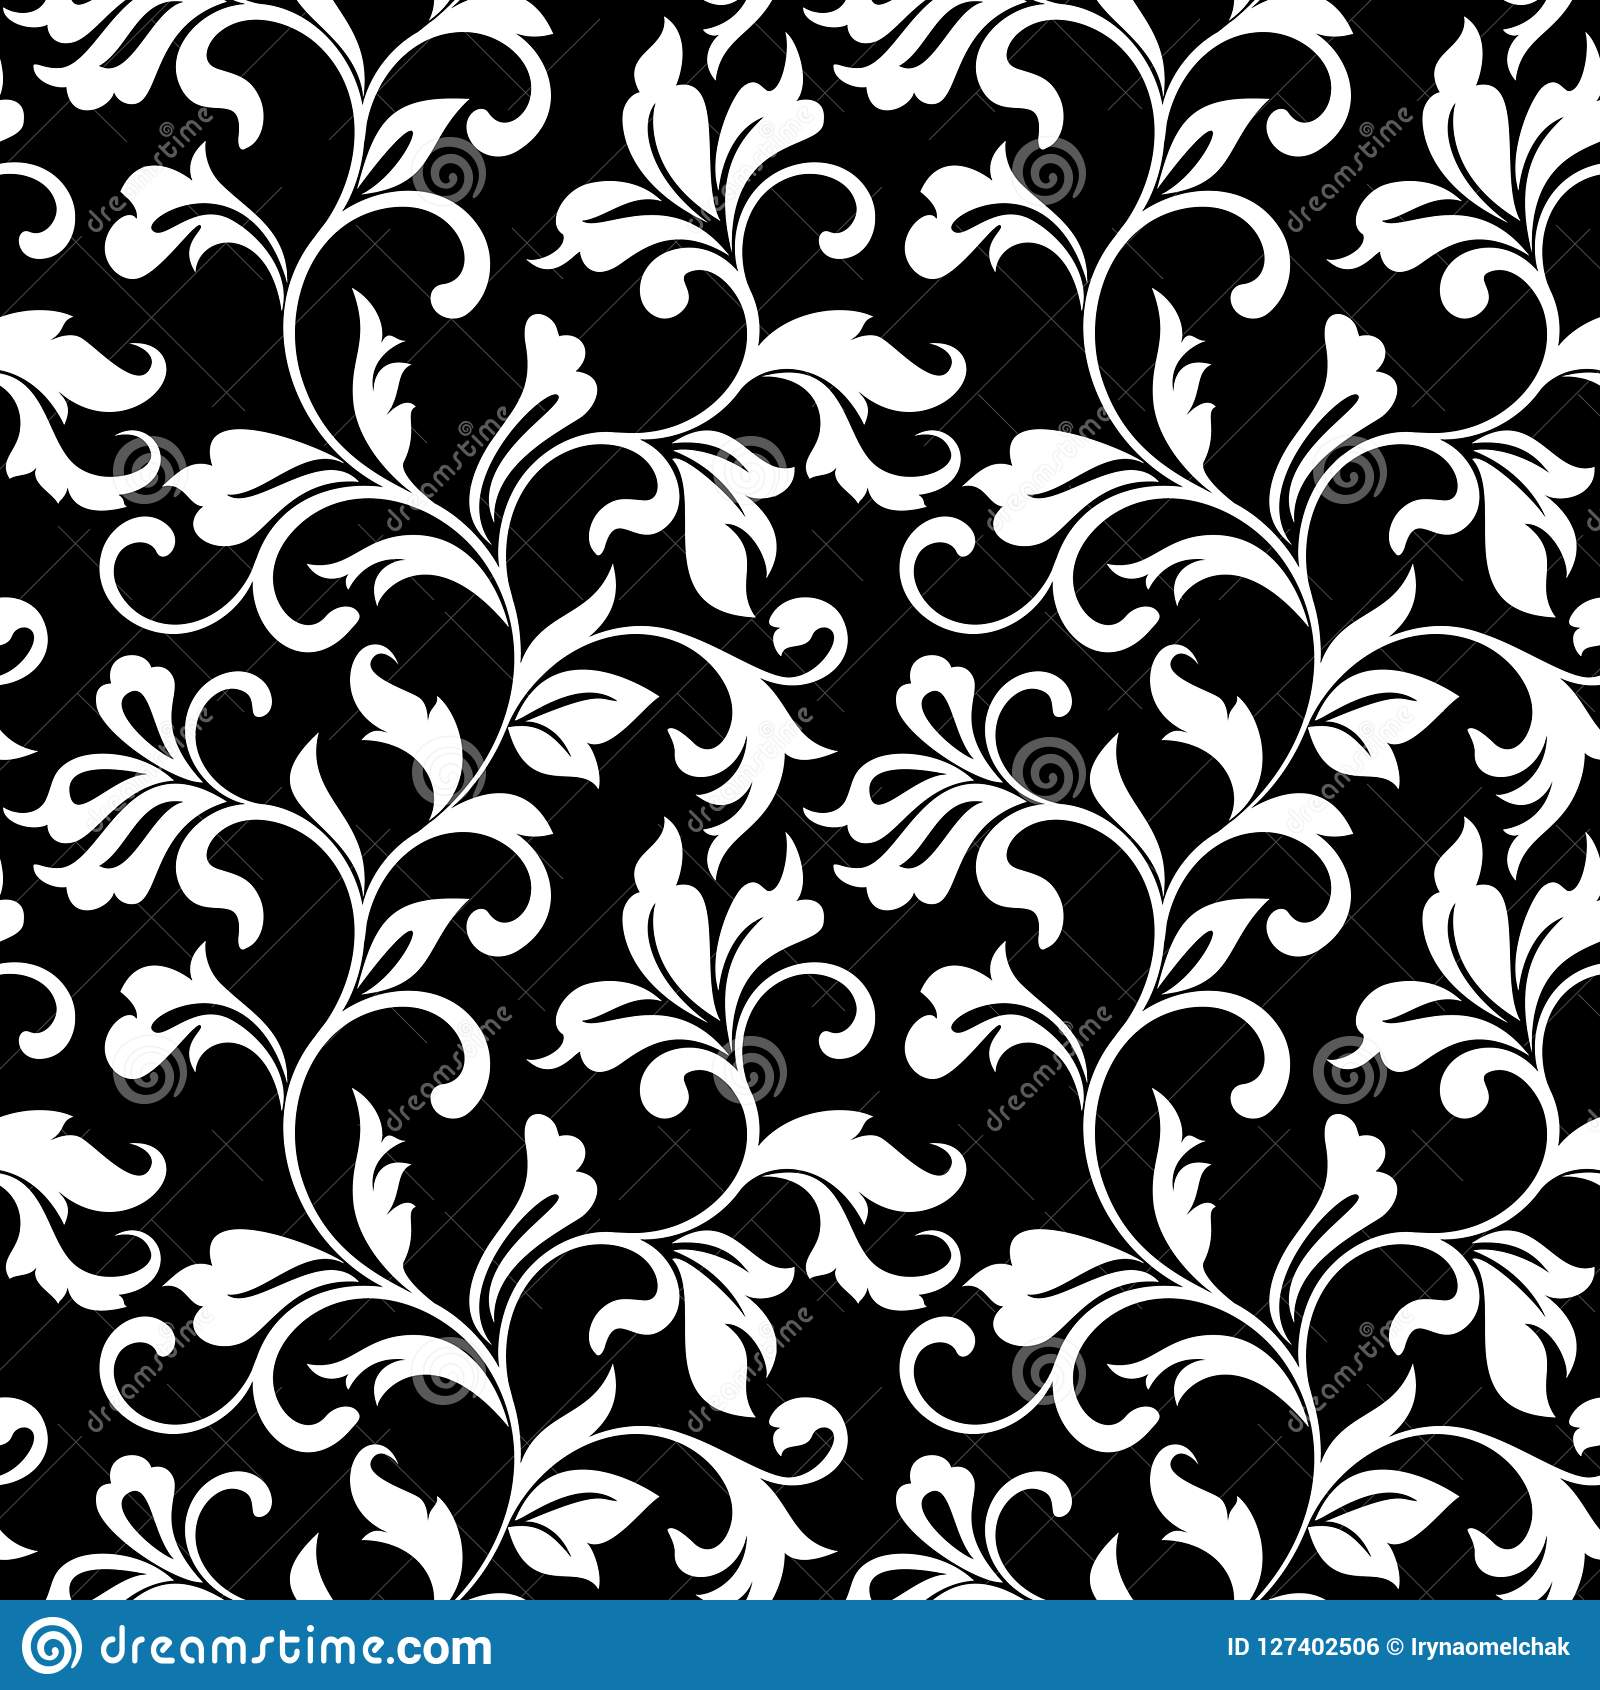 elegant seamless pattern classic tracery black background vintage style texture print wallpaper home decor textile 127402506